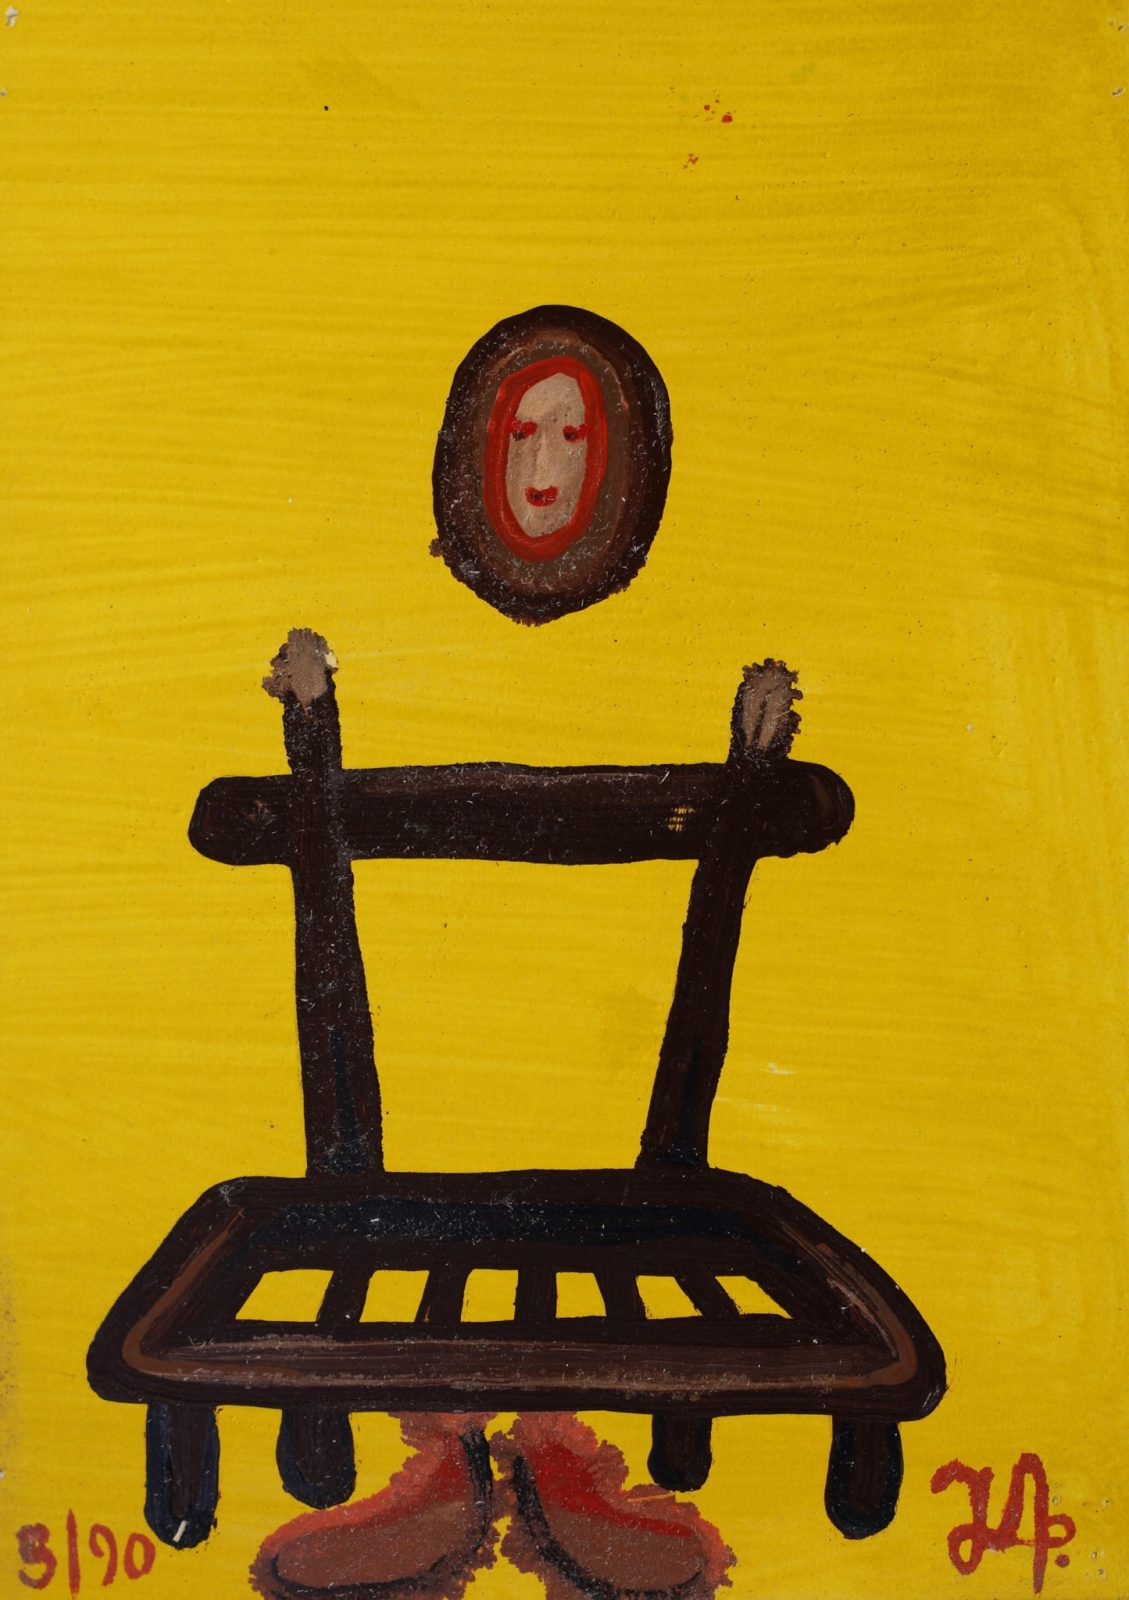 Man & Chair | Yellow #6